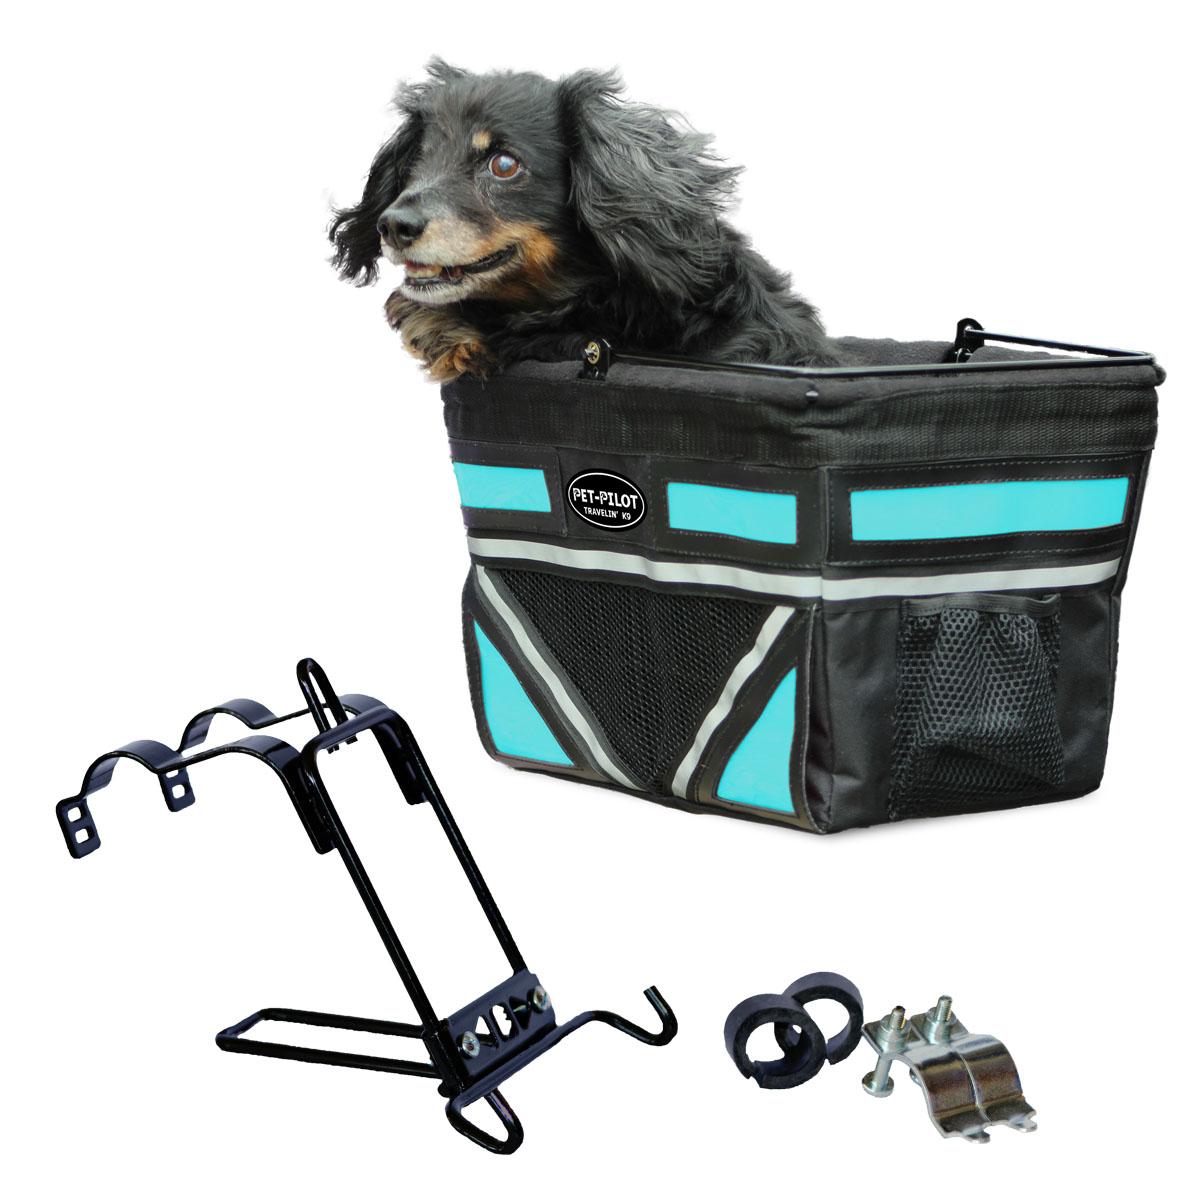 Travelin K9 2018 Pet-Pilot Bike Basket for Dogs & Cats, Neon Blue